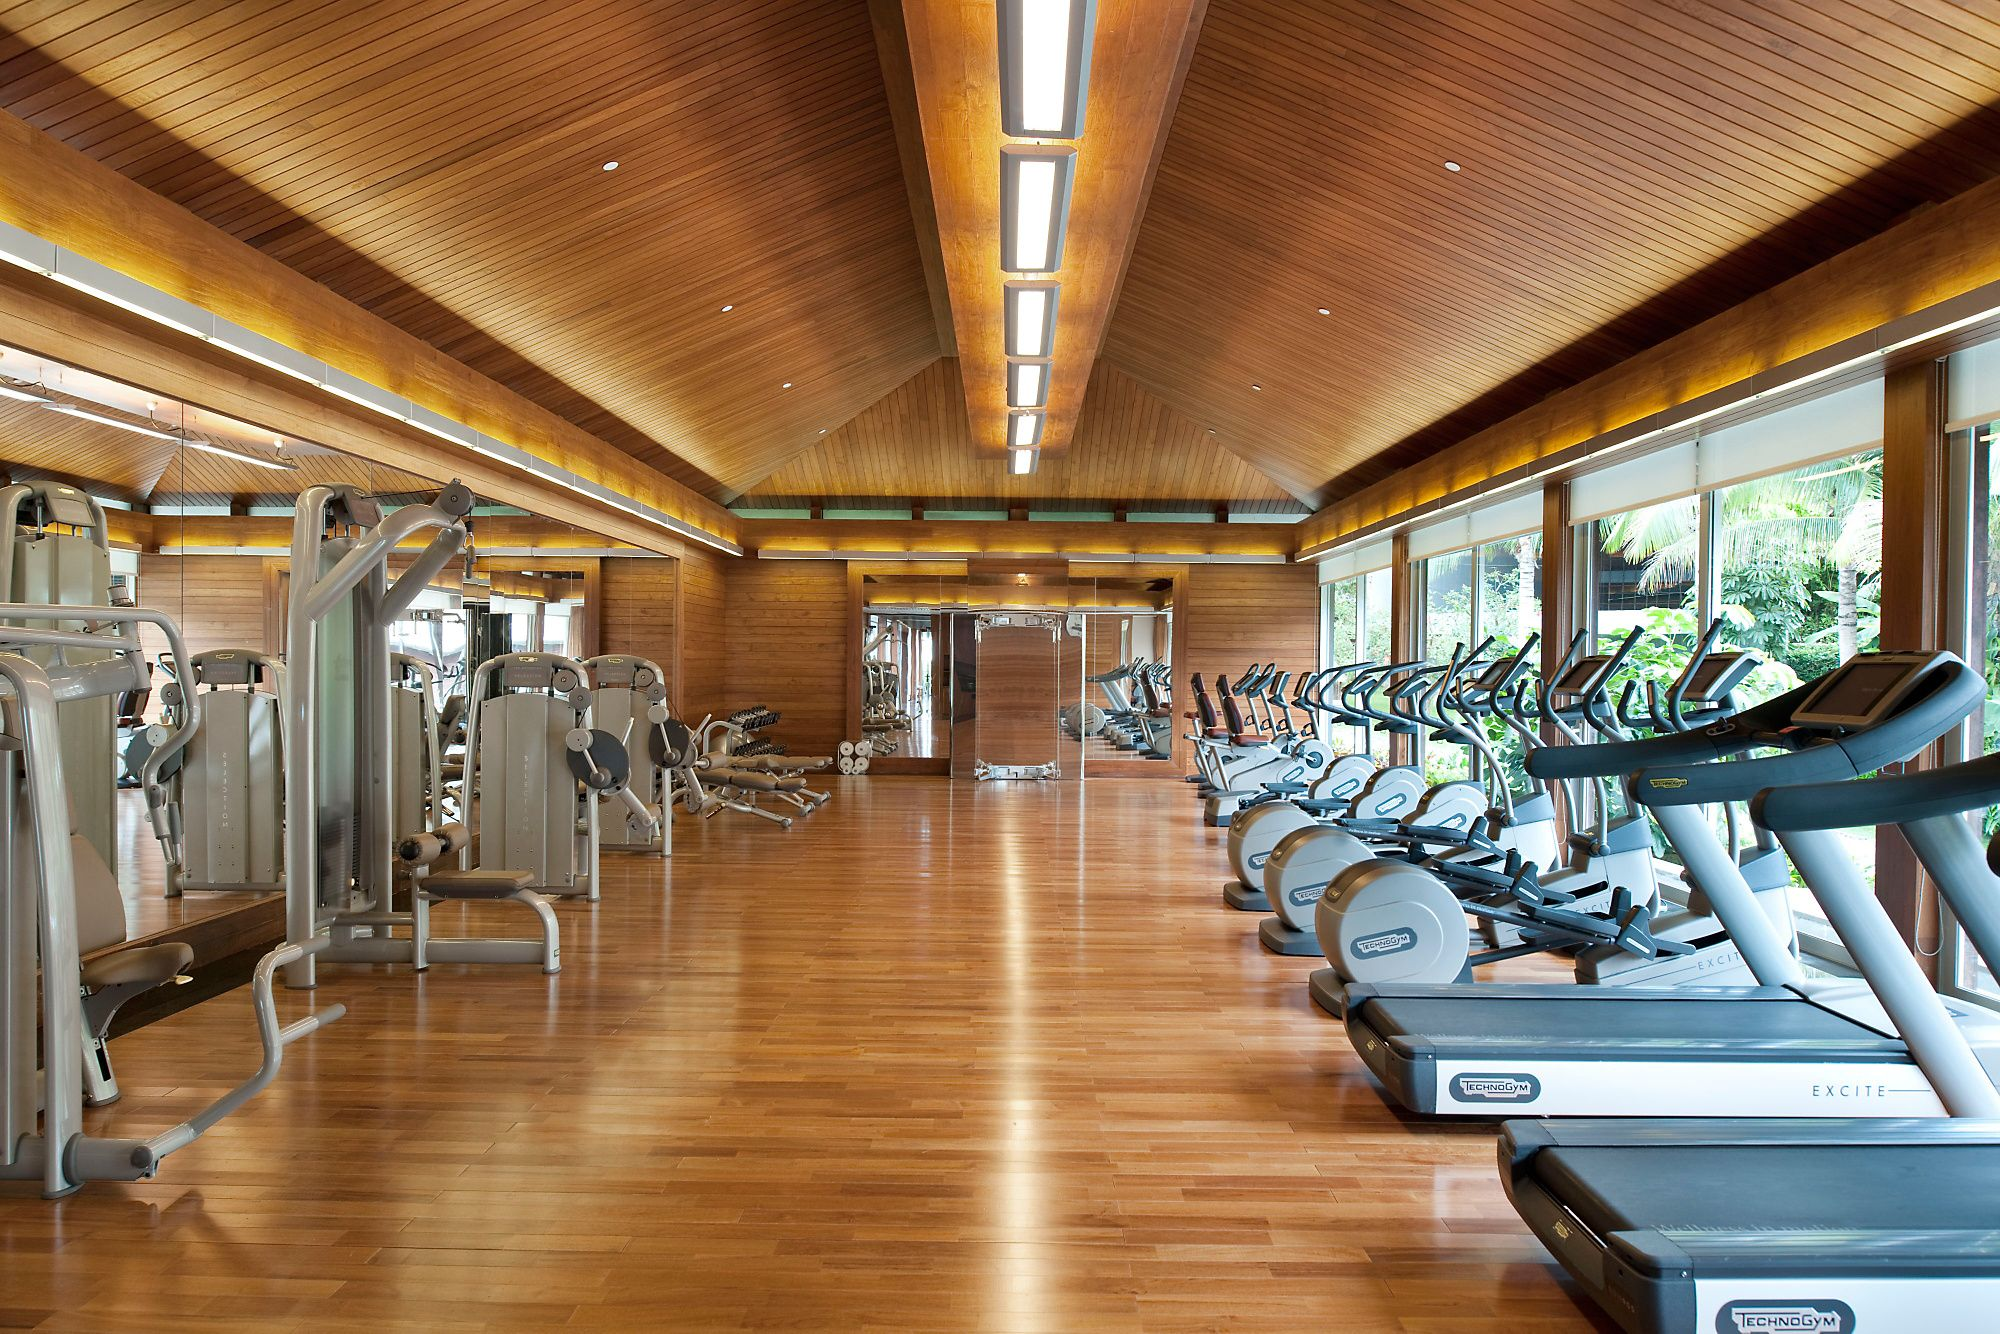 Sportschool IJsselmonde. Fitness sportschool informatie